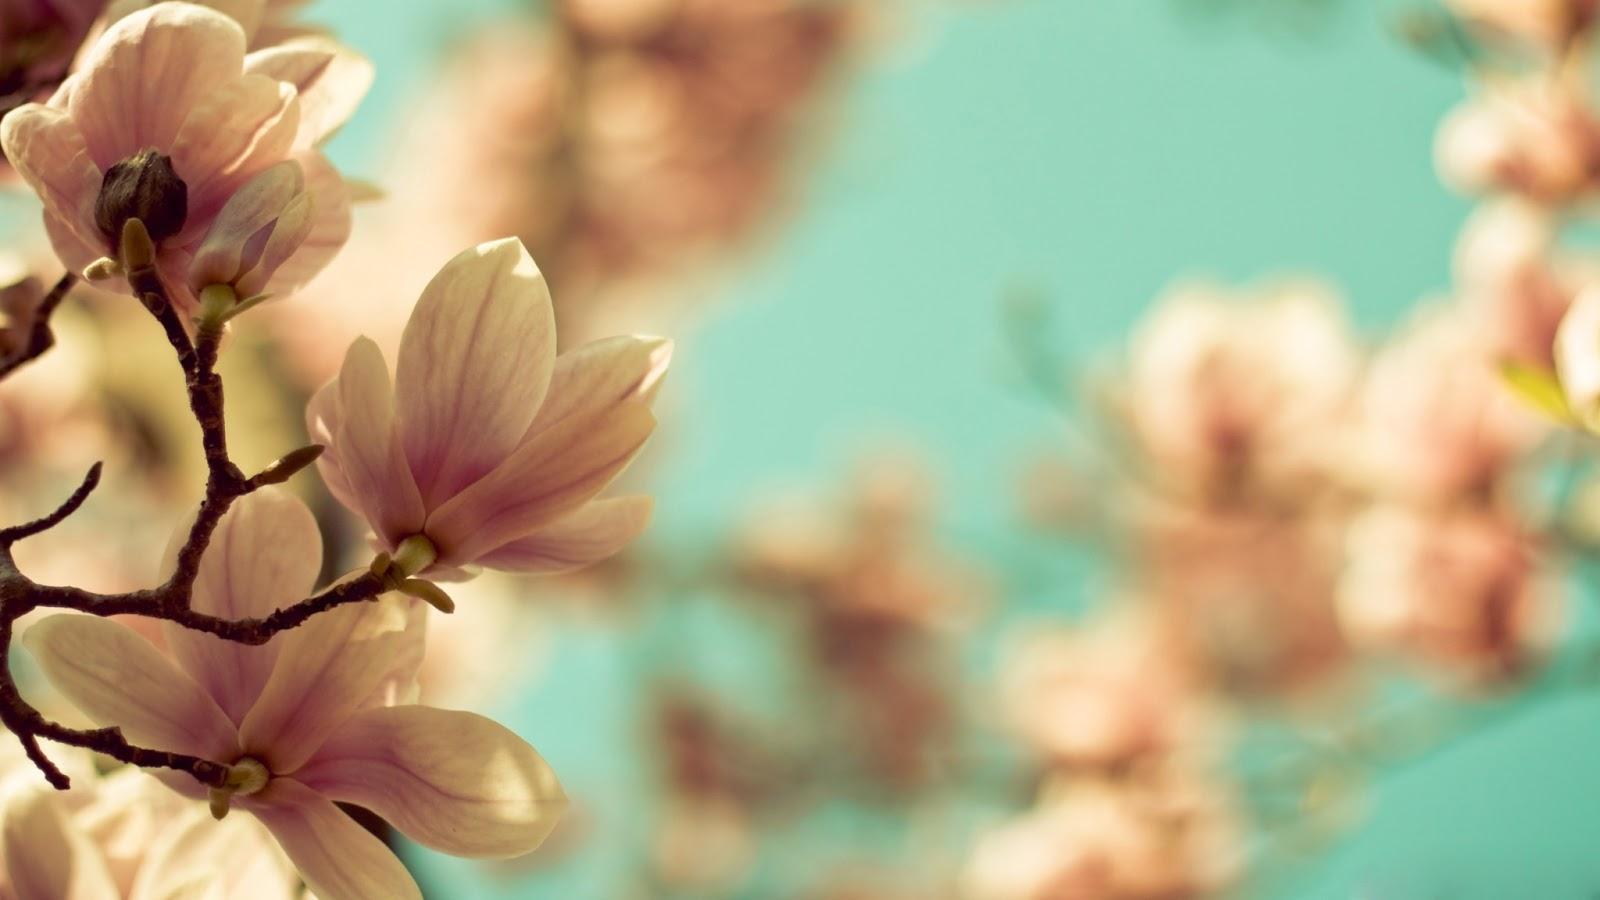 hinh-nen-hd-dep-cho-may-tinh-hoa-mai-hong-small_green_flowers-wallpaper-2560x1440